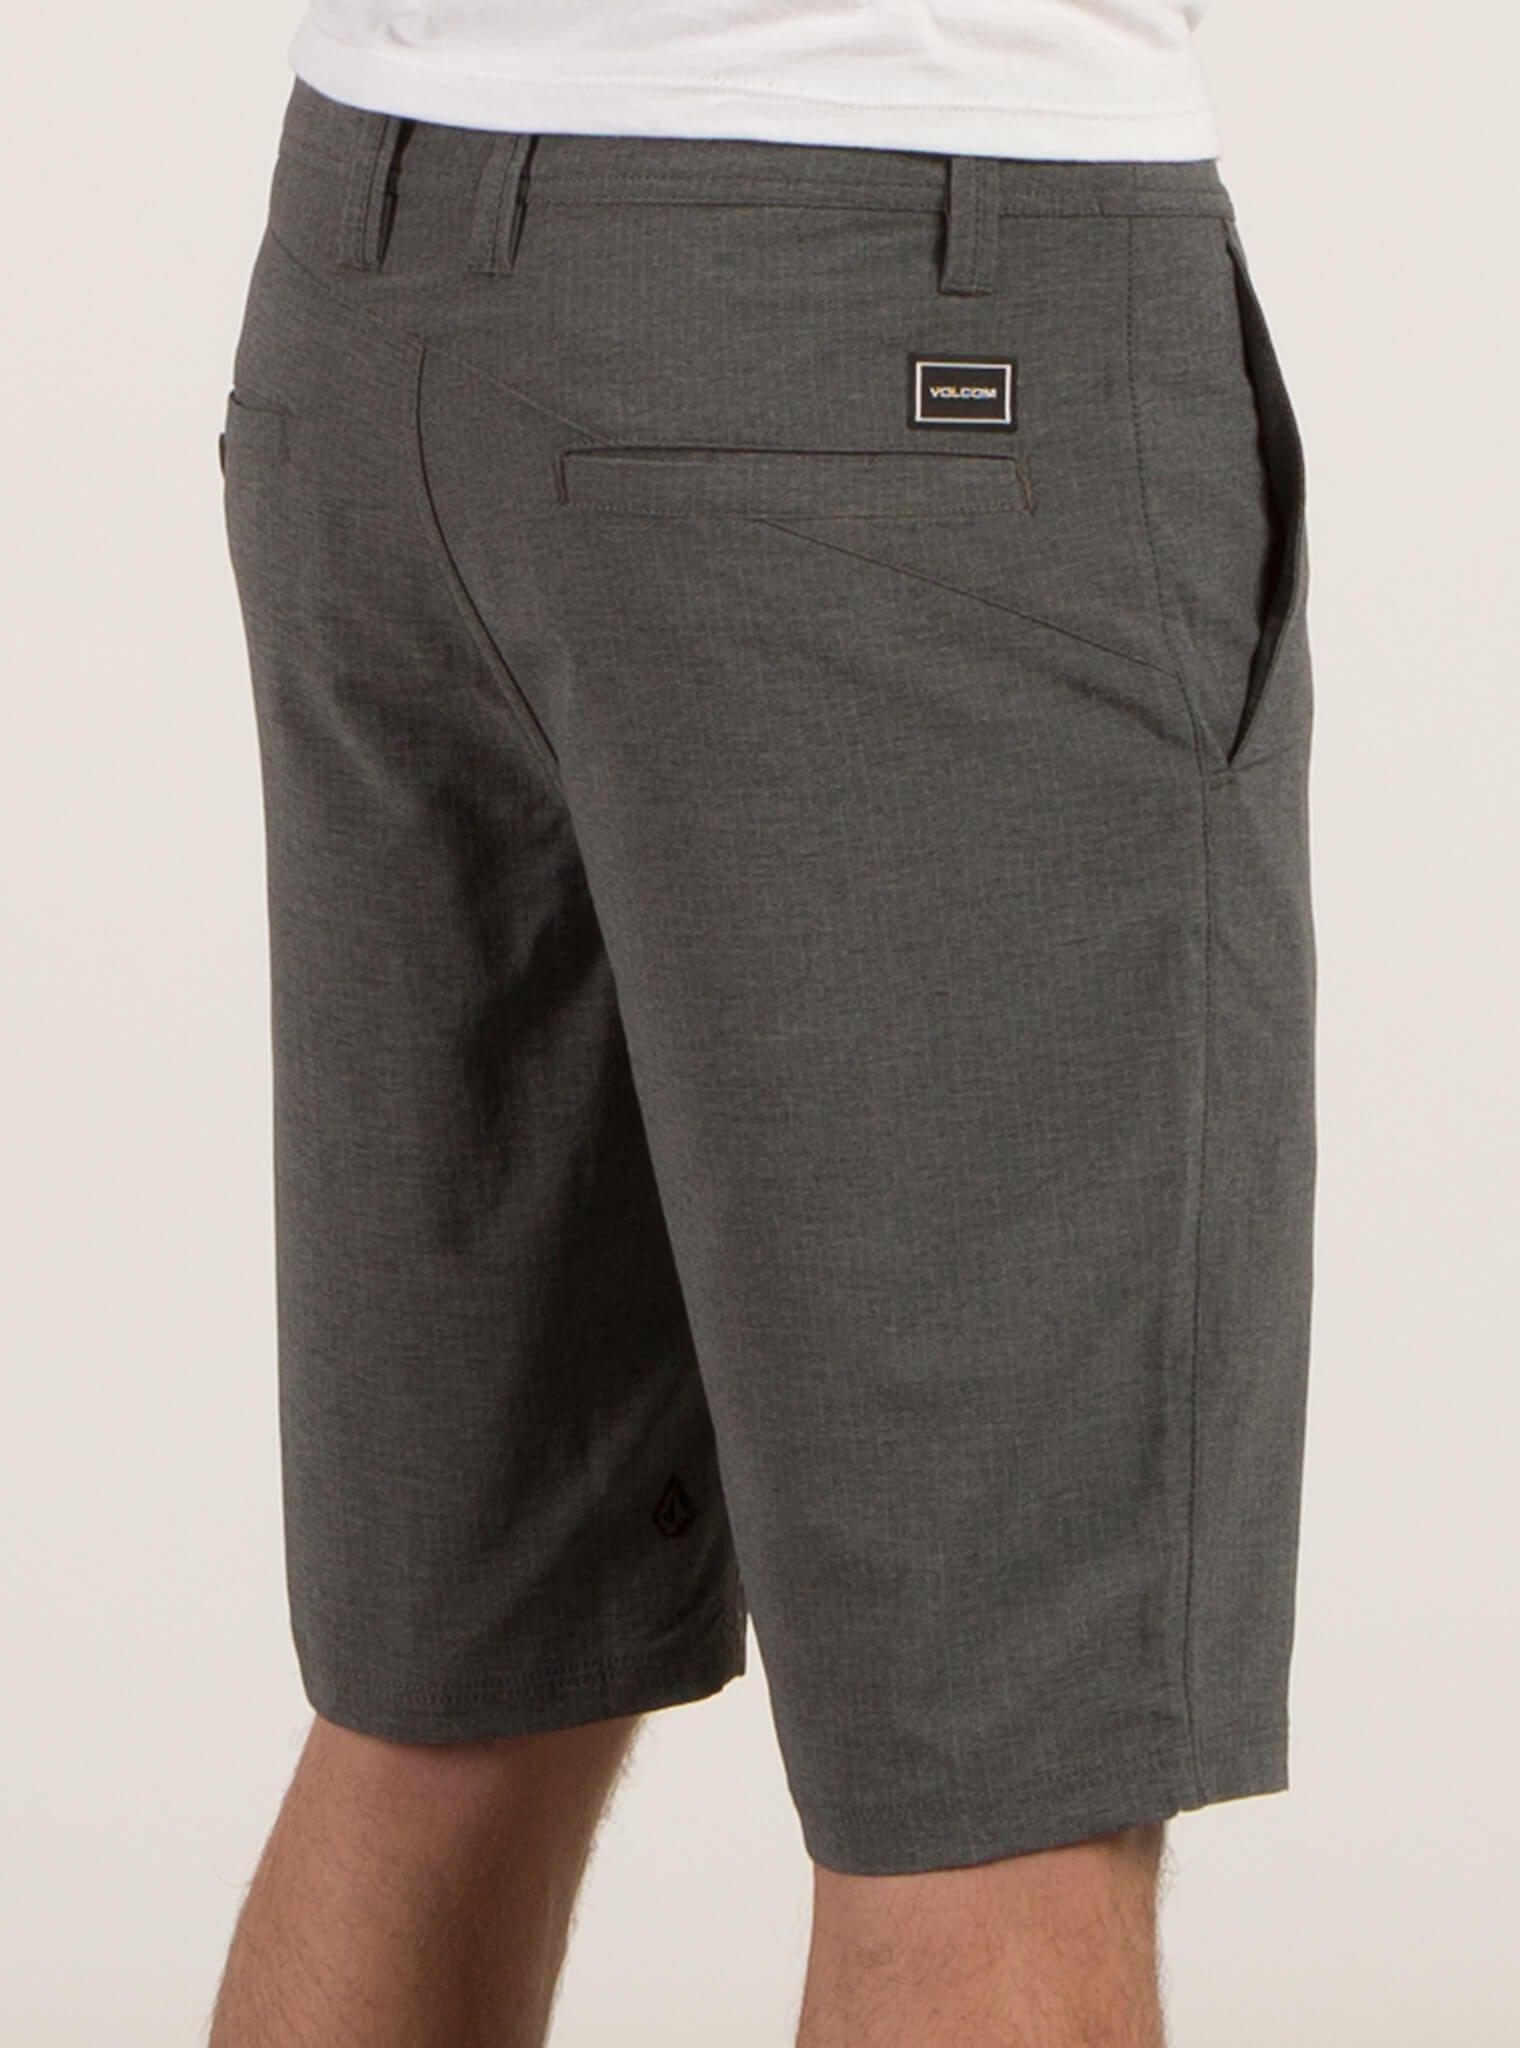 6f3515a7f6 Volcom surf shorts Surf shorts Shorts and Black